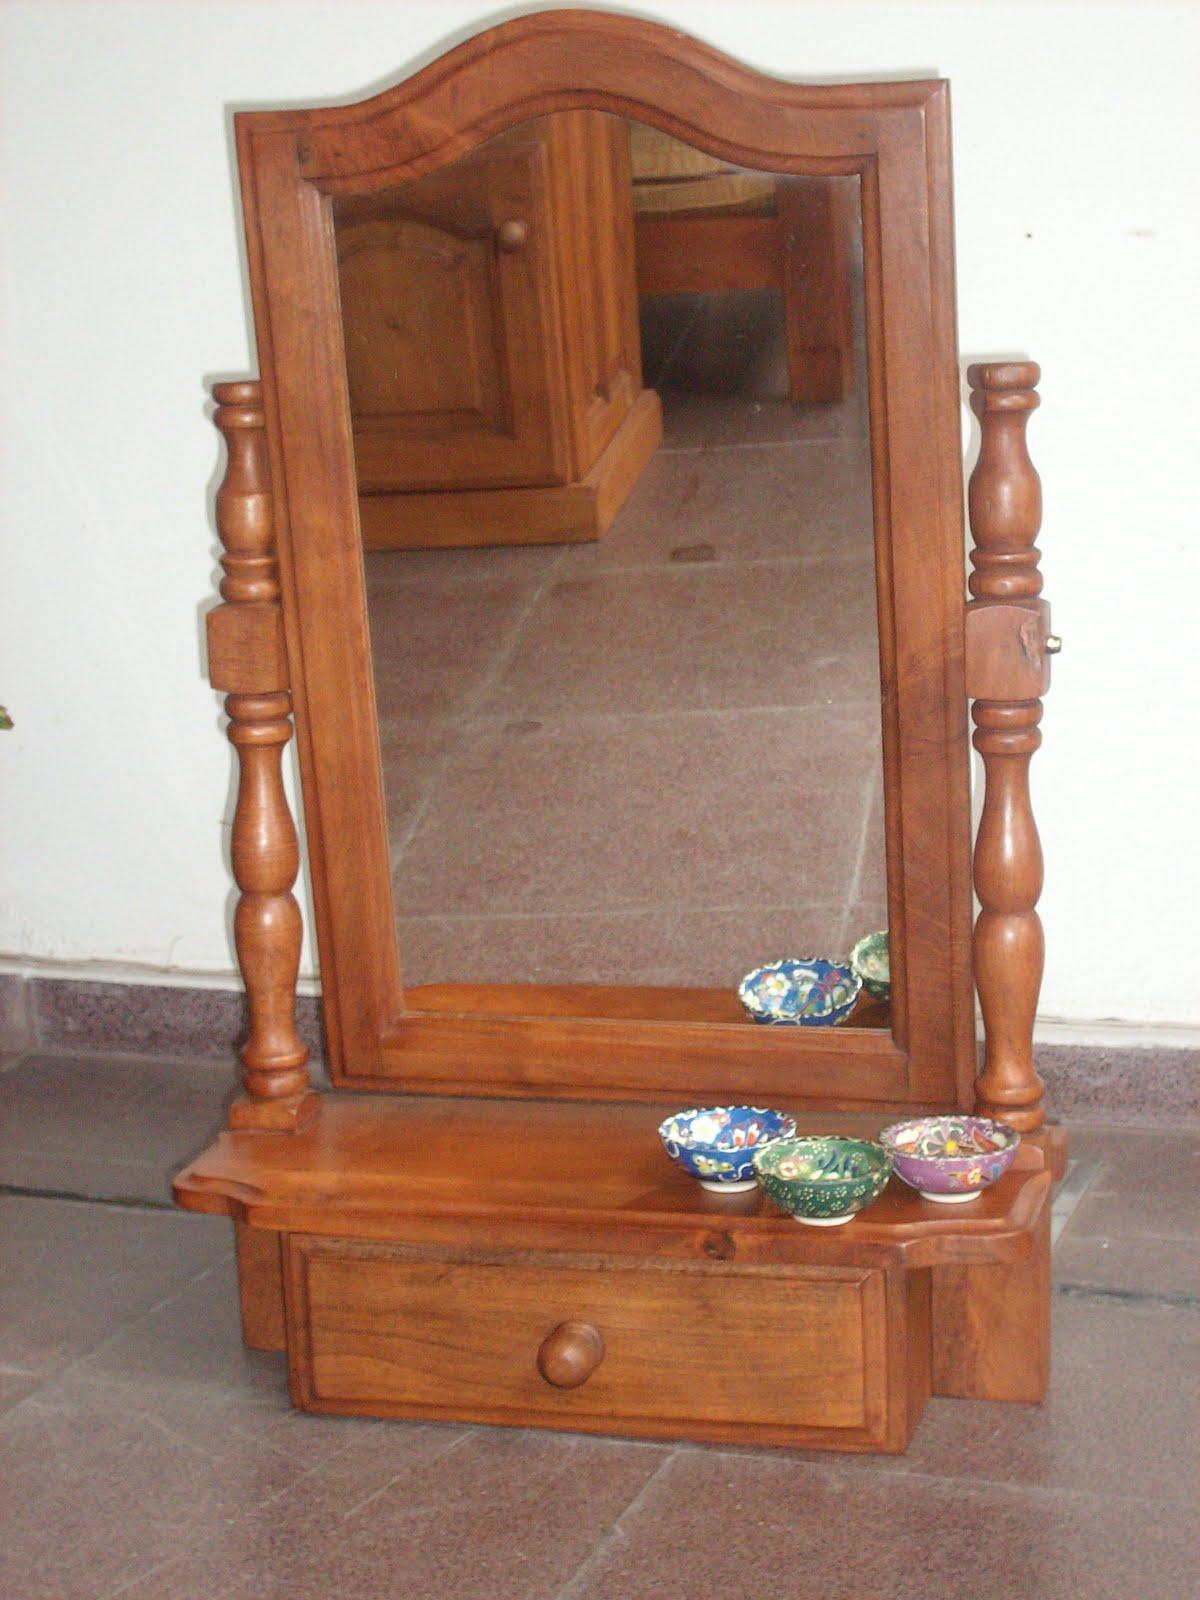 Mundoalgarrobo espejo de pie con el marco de algarrobo for Espejo de pie